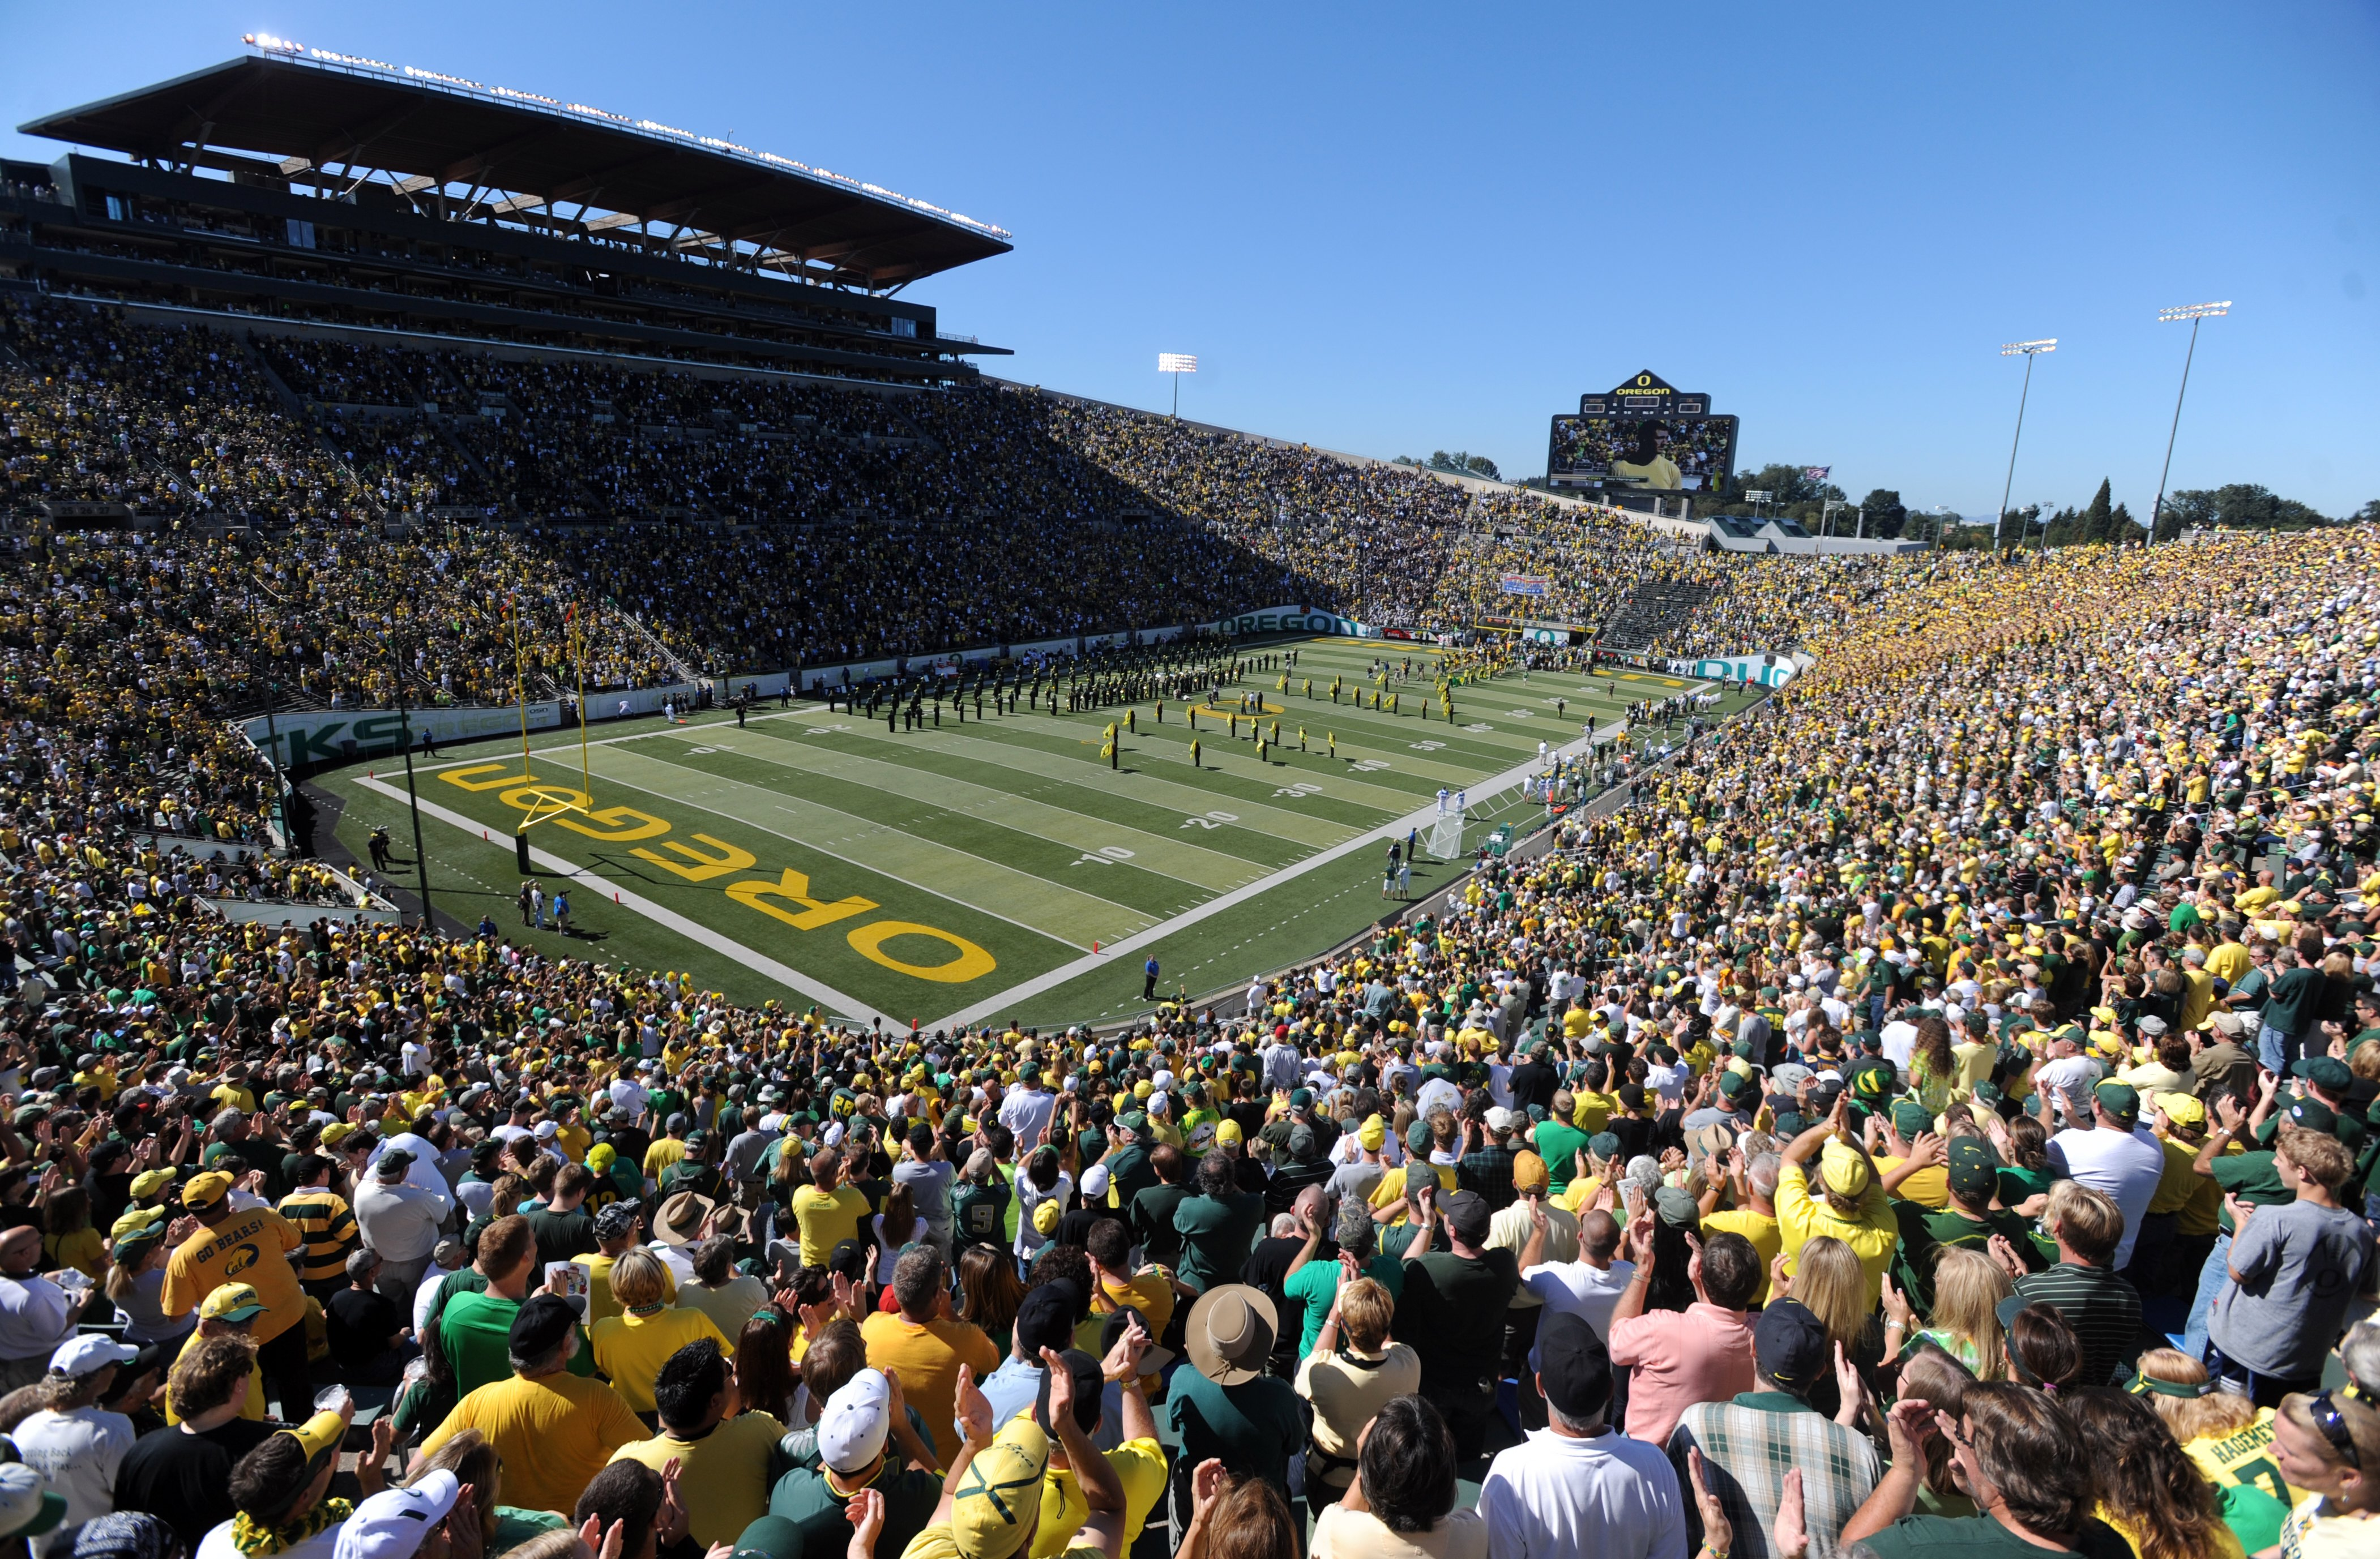 arizona-Wildcats-Oregon-ducks-game thread-live-updates-pac12-football-chat